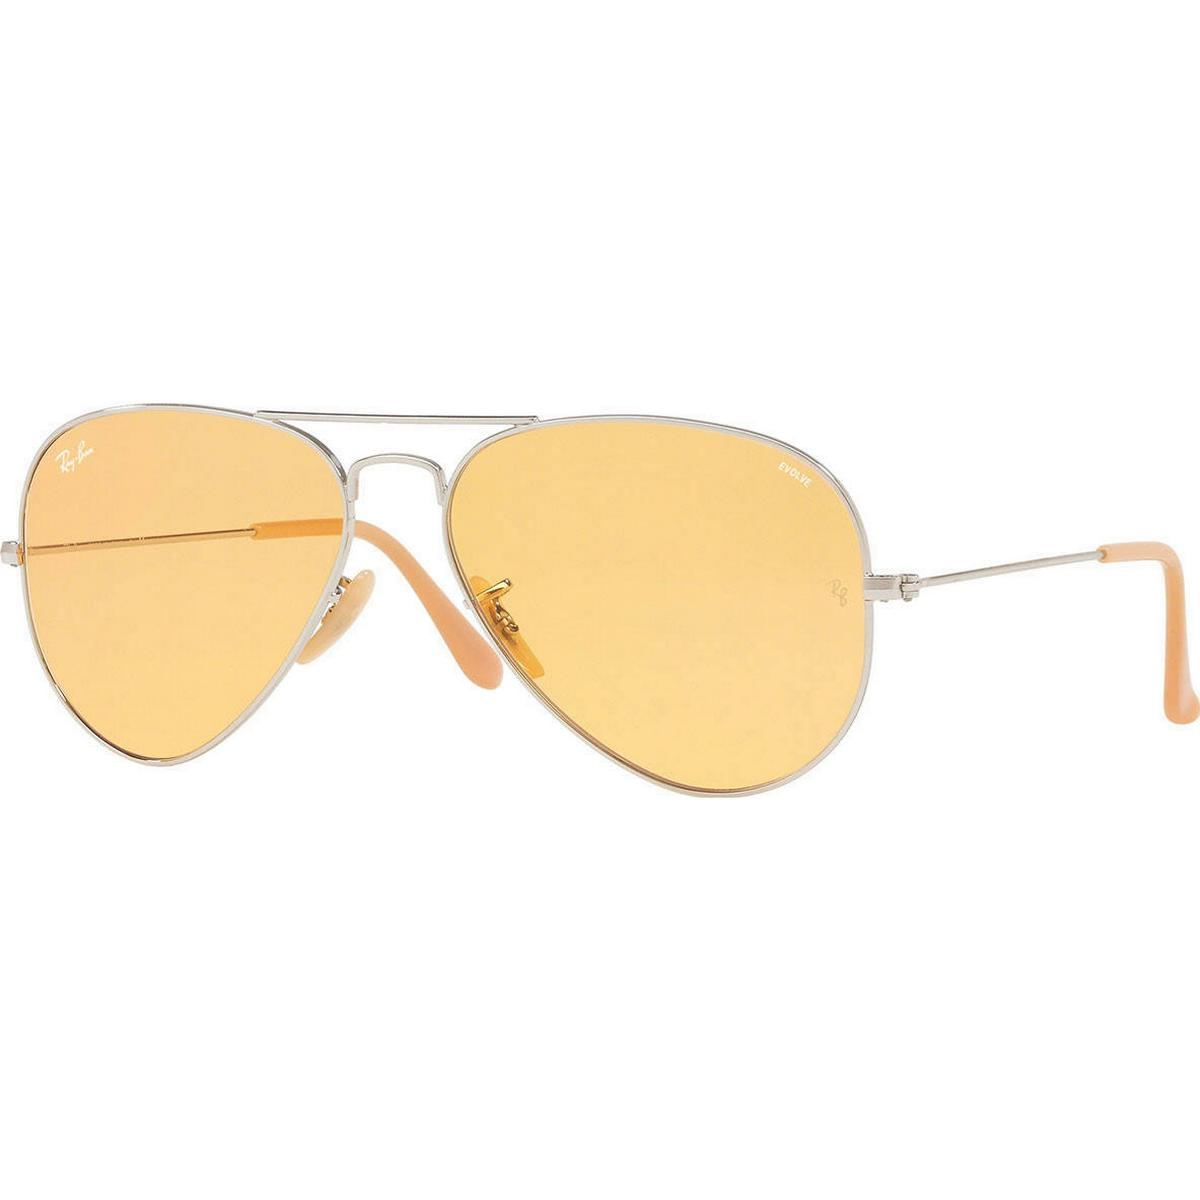 Ray Ban Orange Solglasögon (34 produkter) • Se billigste